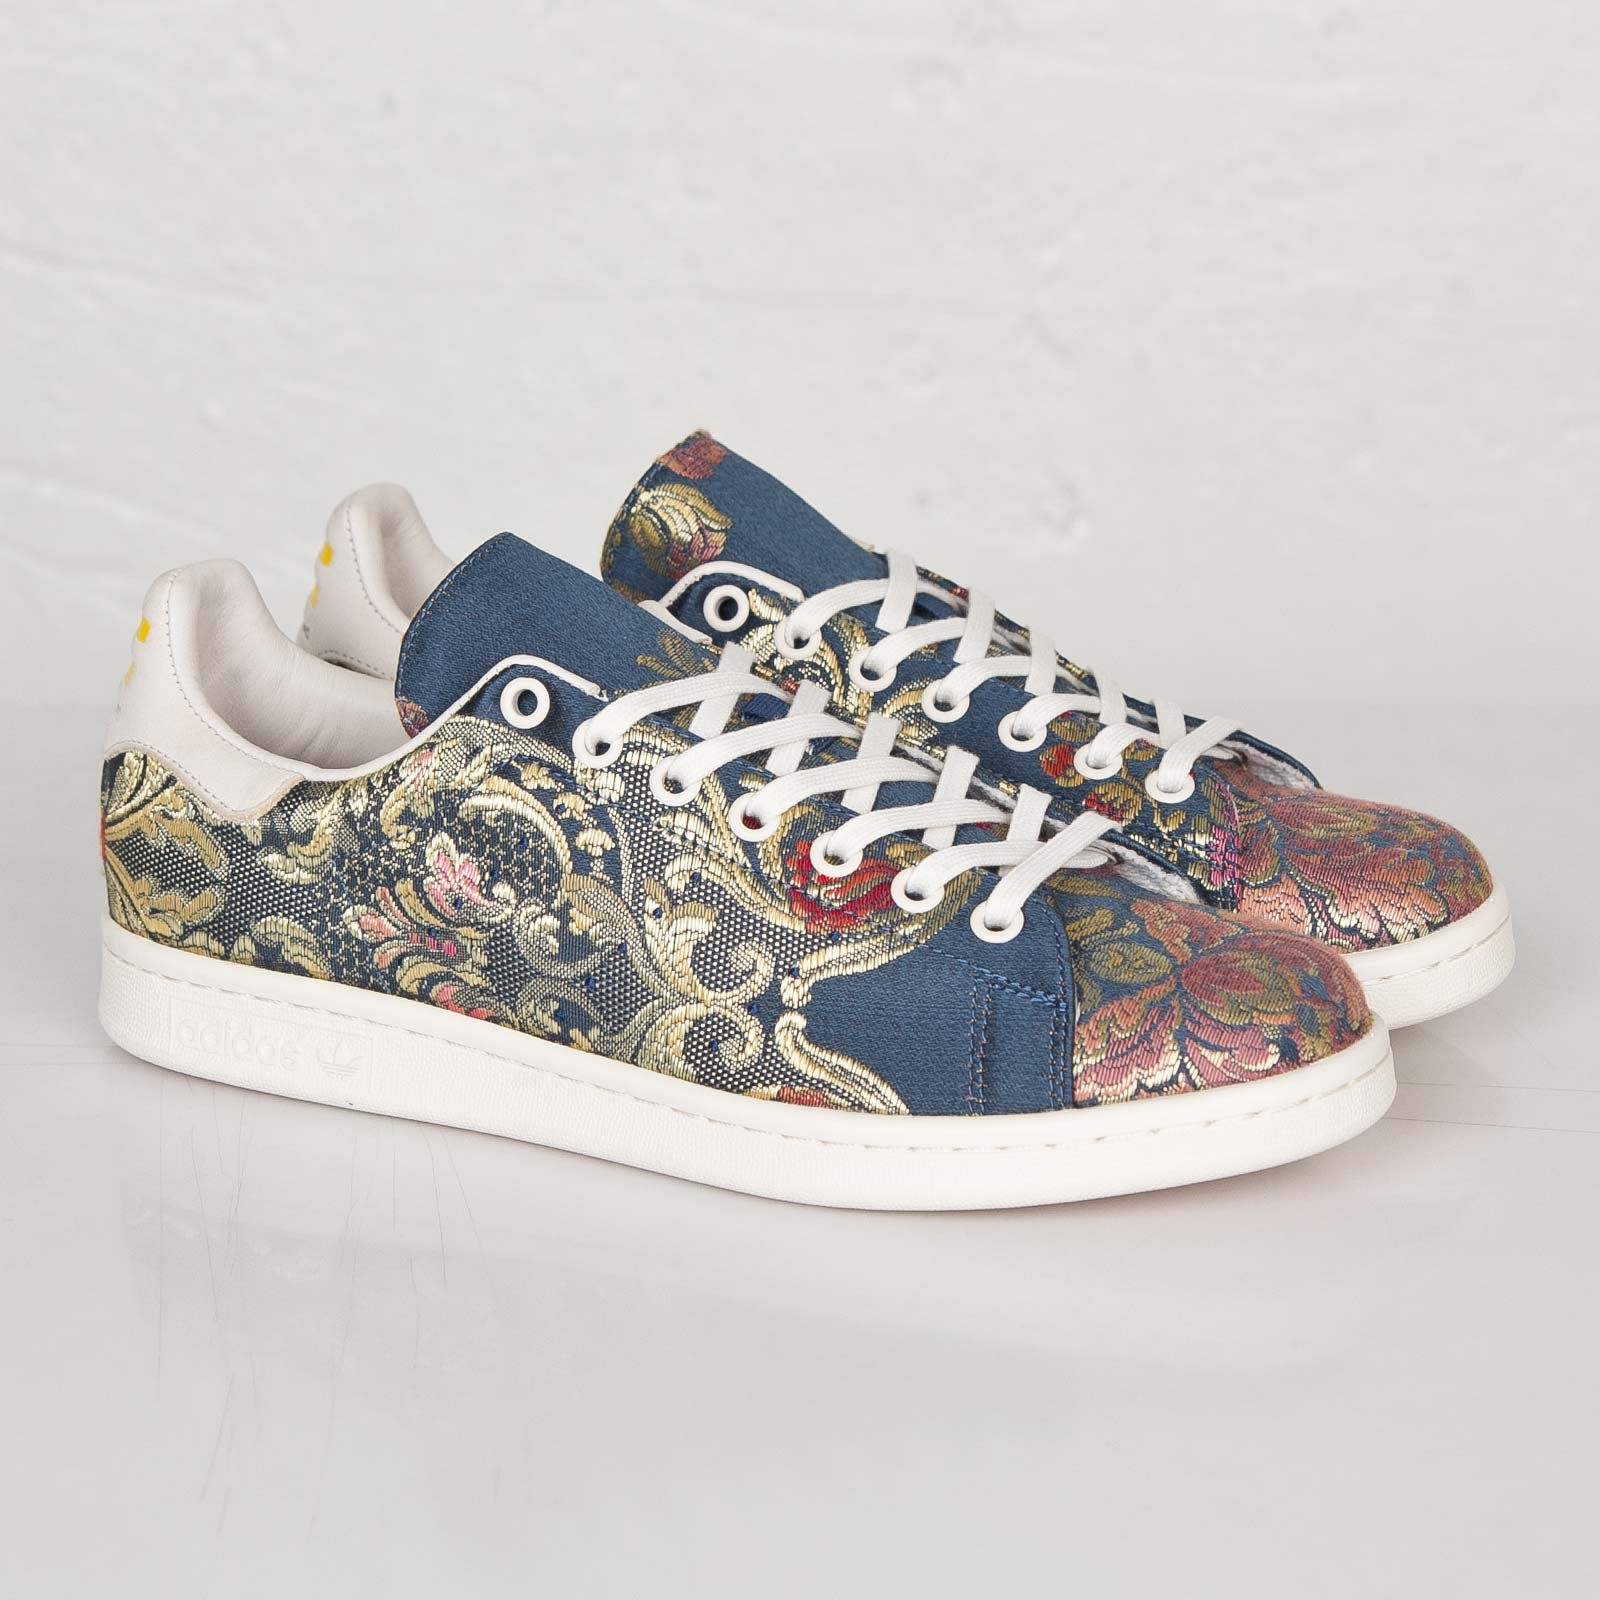 2fa5f45e976e adidas PW Stan Smith Jacquard - B25384 - Sneakersnstuff